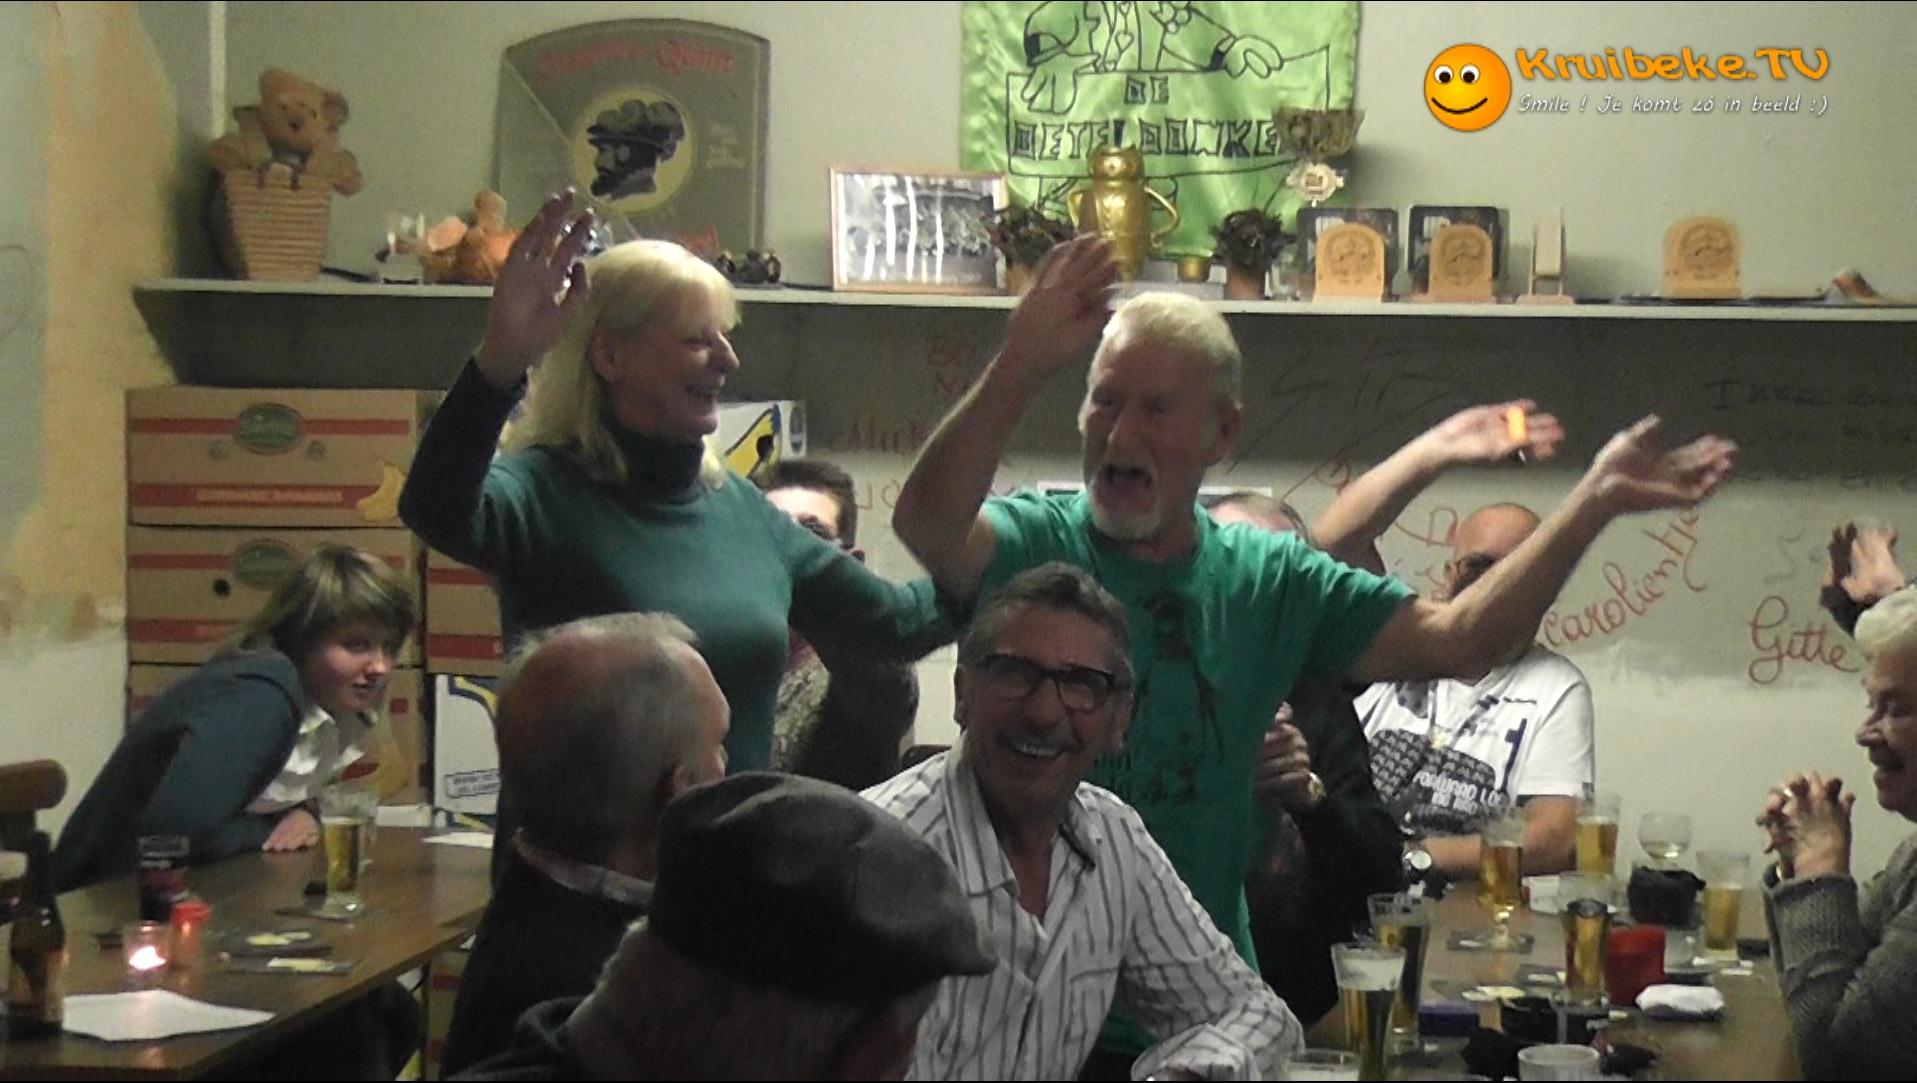 Volkscafe 't Hoekske uit de Hoogstraat in Bazel